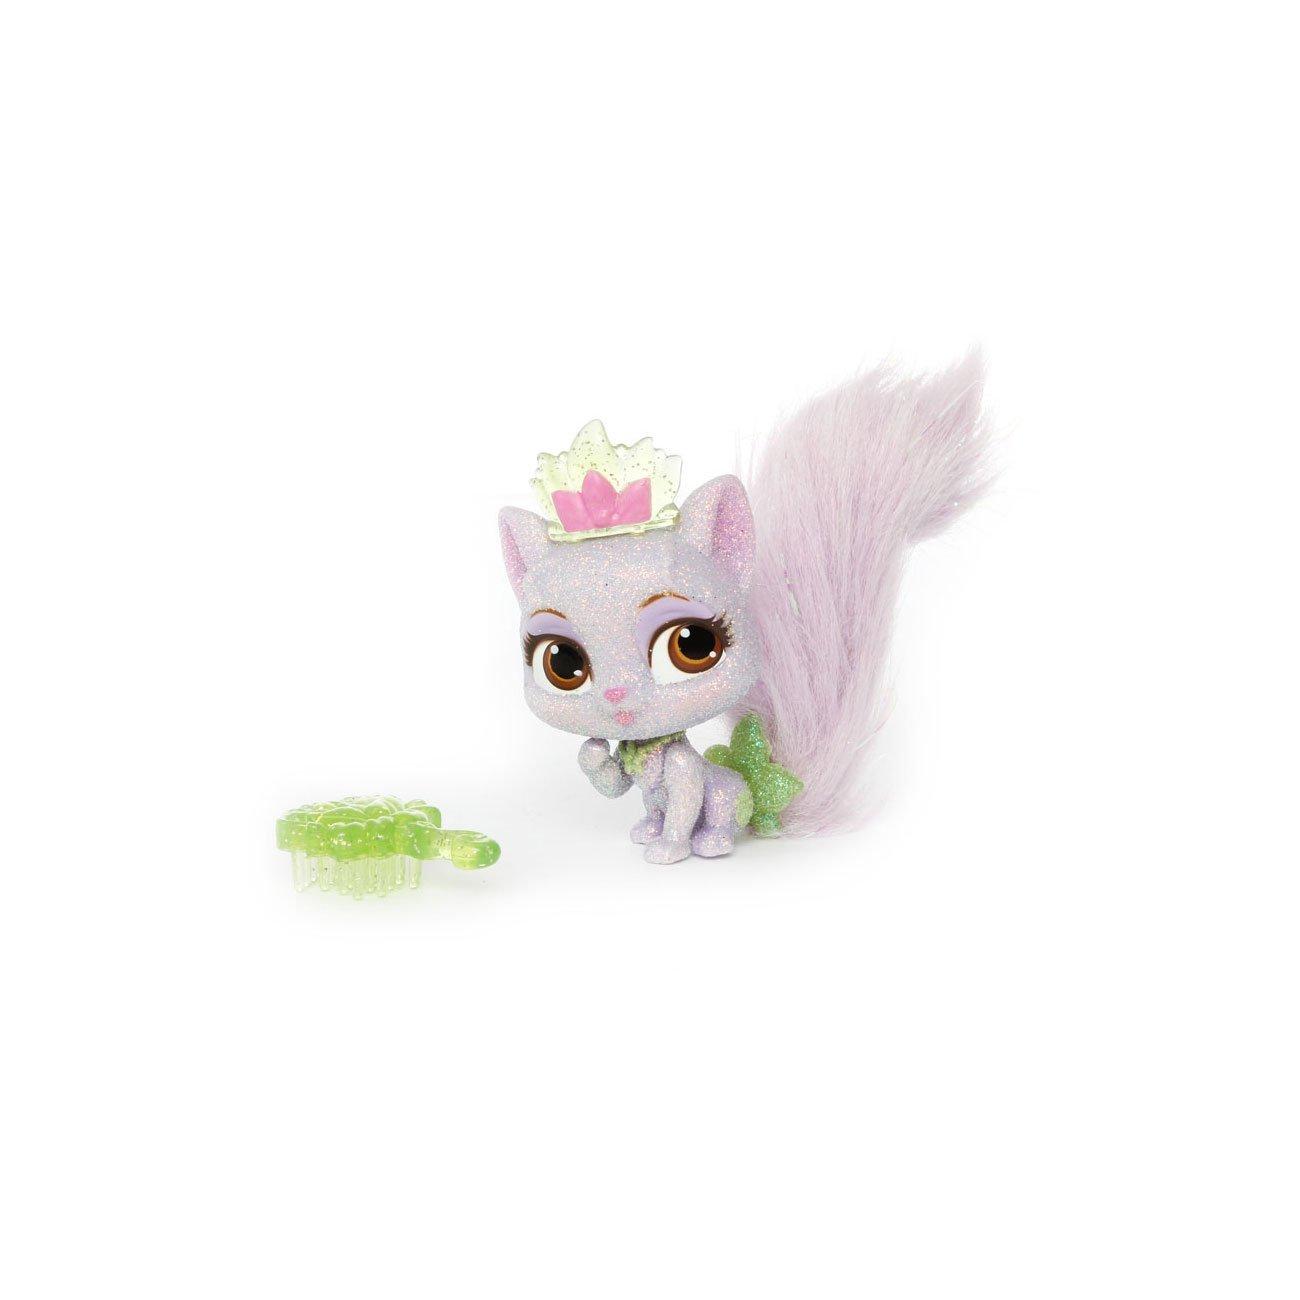 Disney Princess Palace Pets - Glitzy Glitter Friends - Tiana's Kitty, Lily